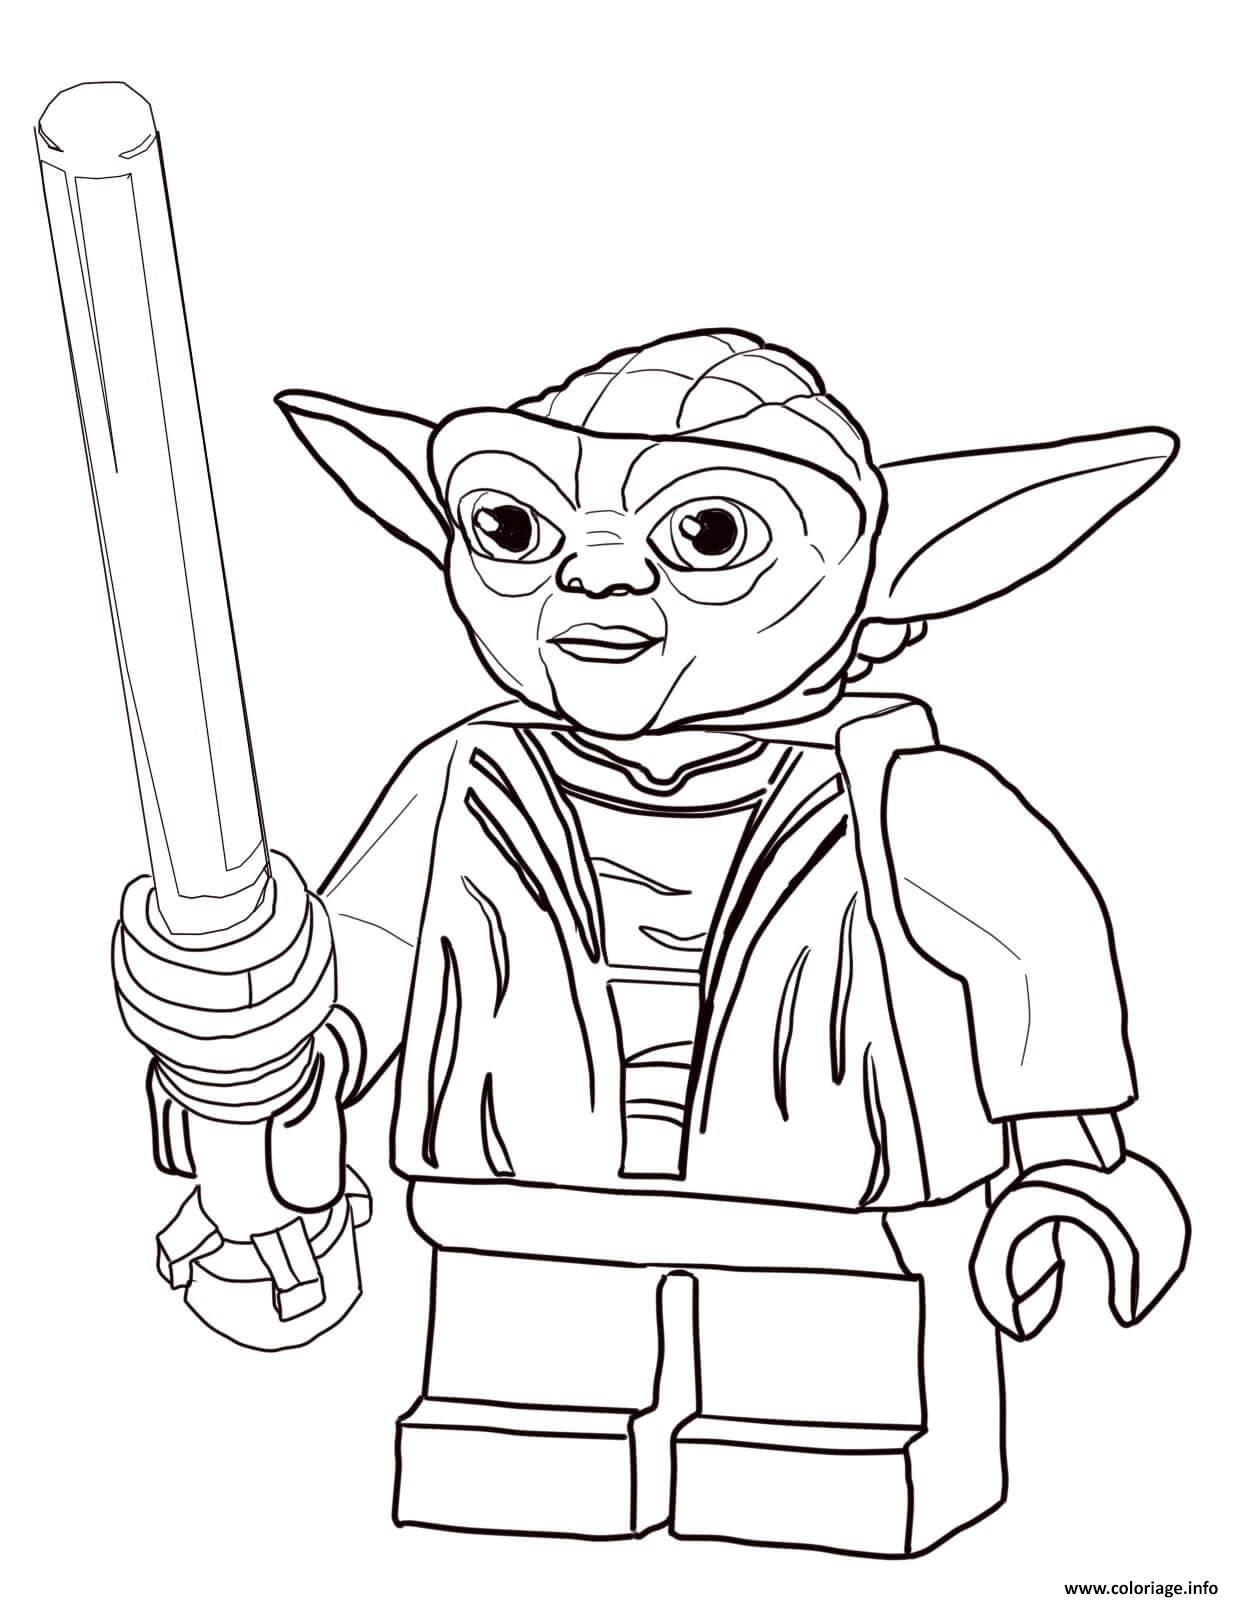 Coloriage Lego Star Wars Master Yoda Jecoloriecom